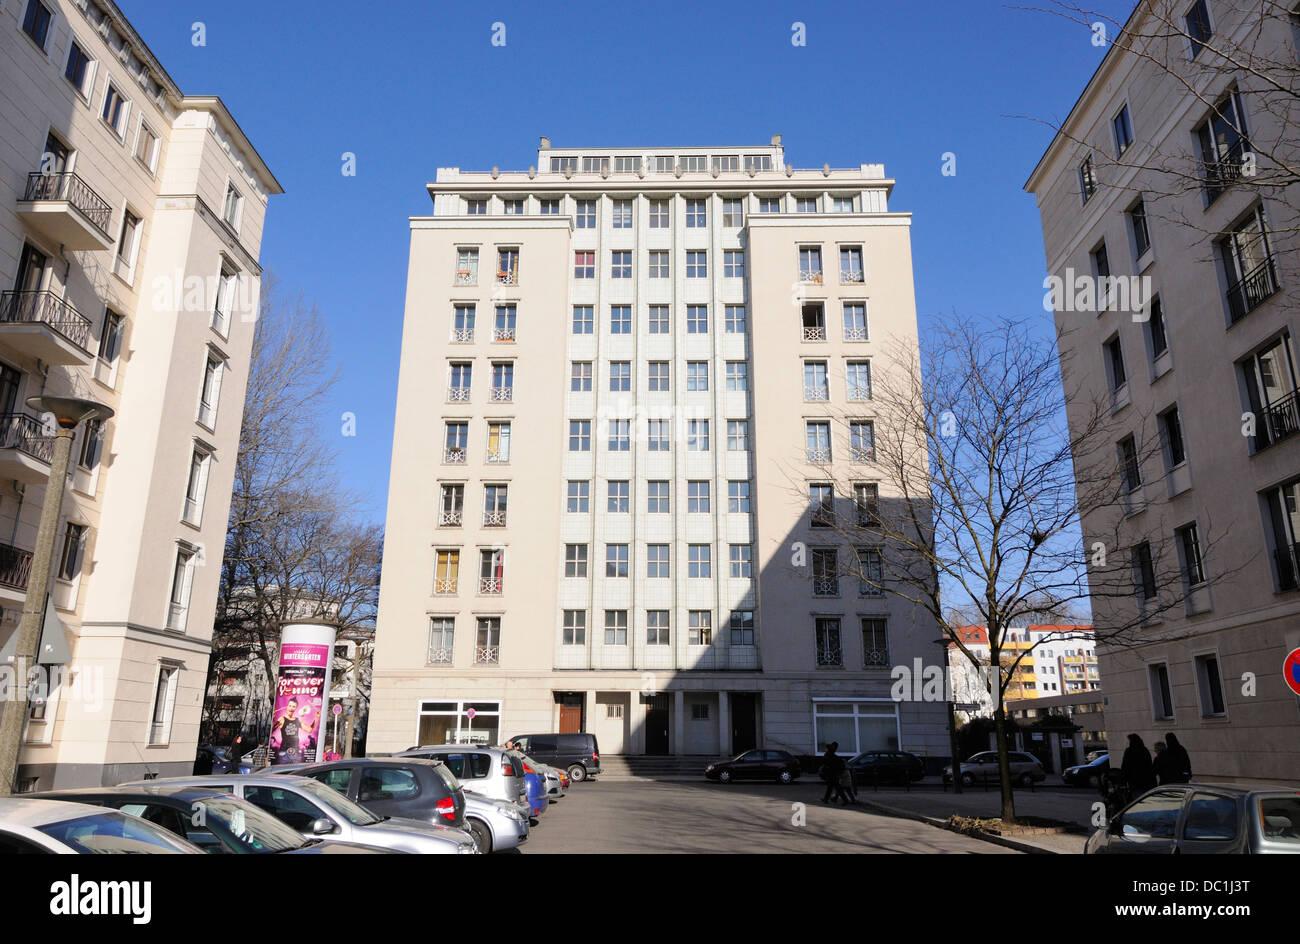 Hochhaus an der Weberwiese, Berlin, Germany. - Stock Image